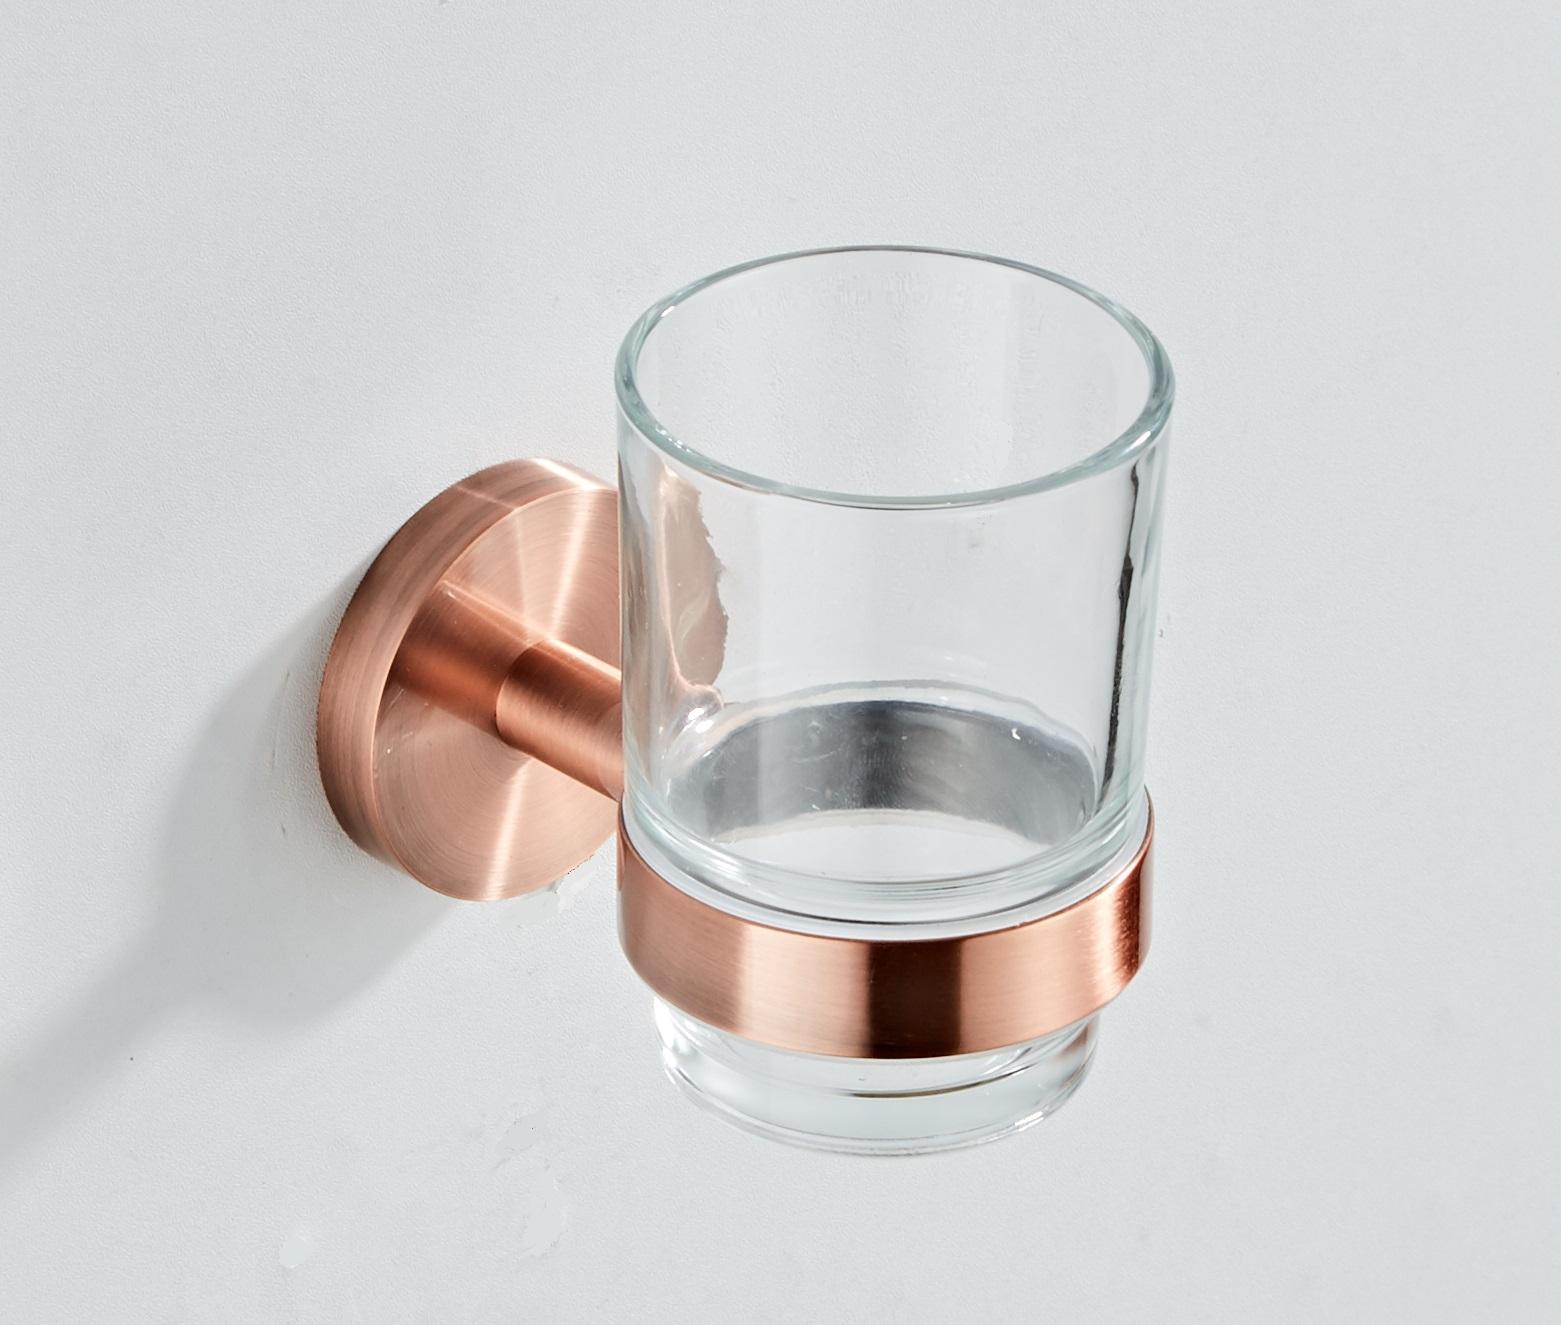 Saniclear Copper glashouder geborsteld koper